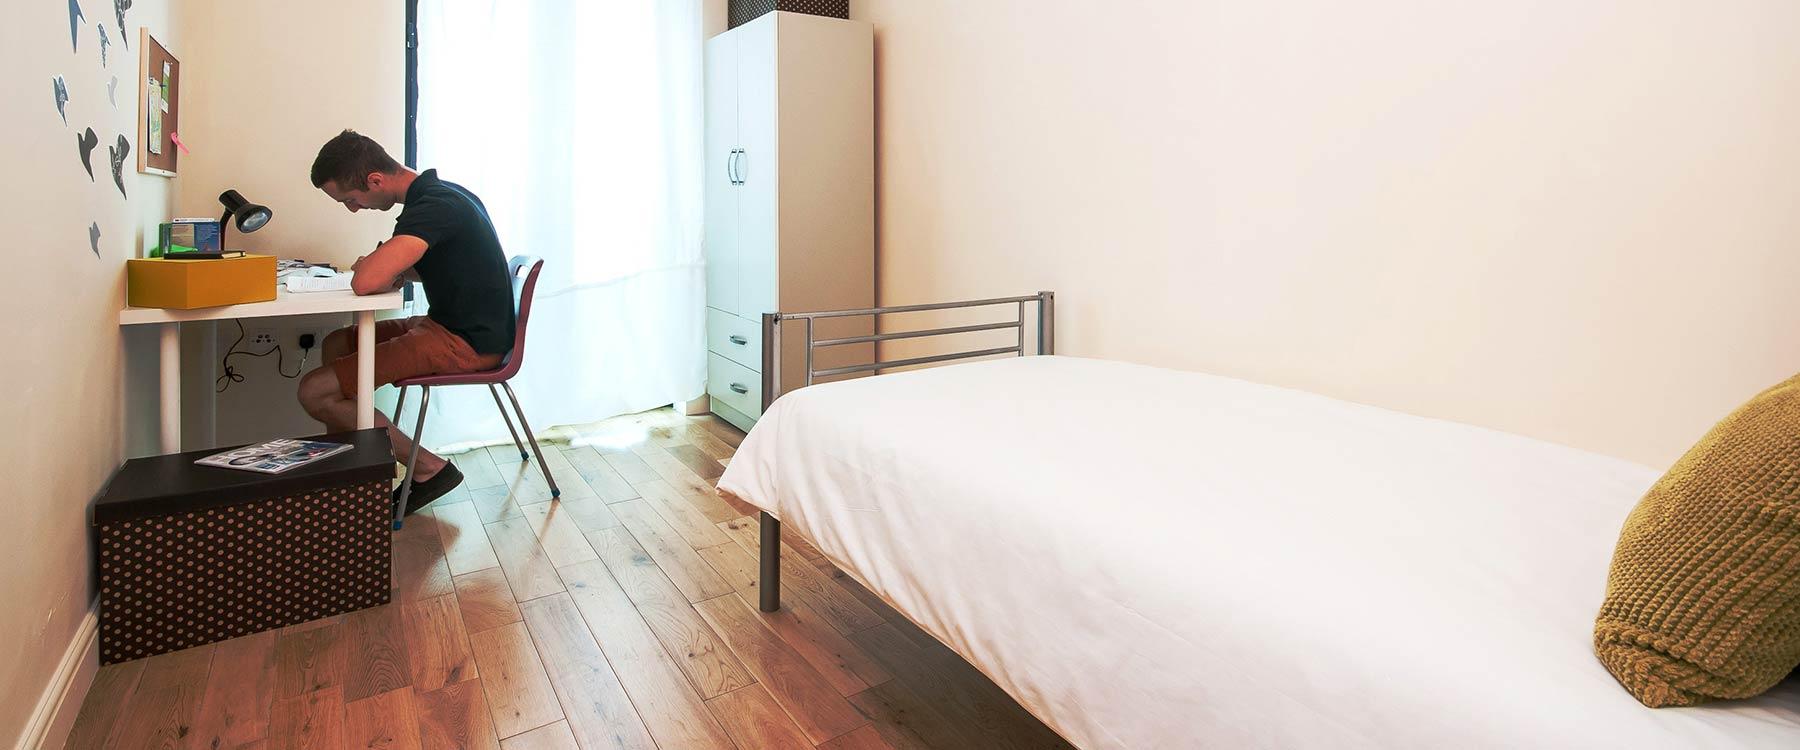 Residencia 3